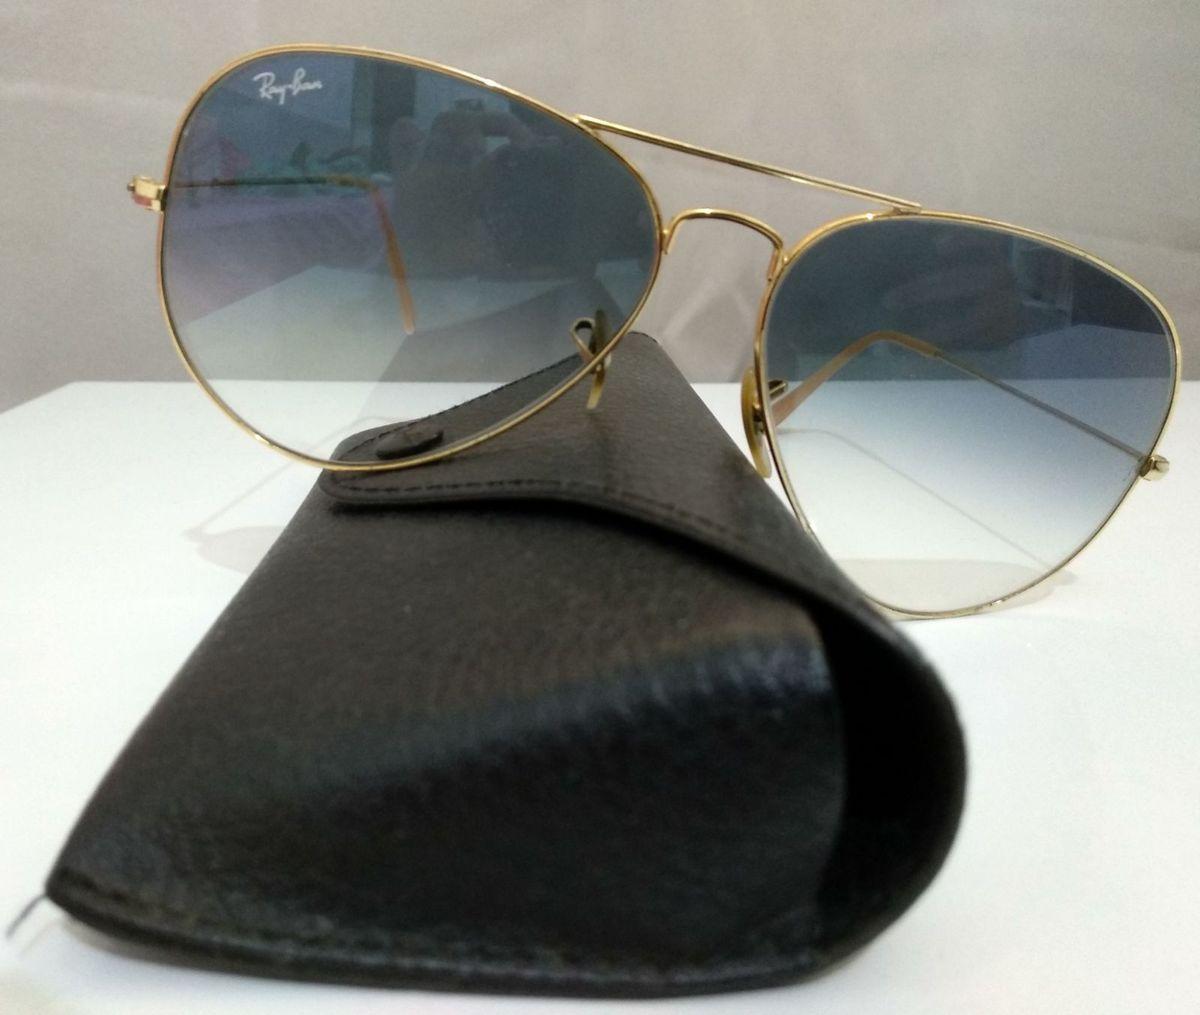 óculos ray-ban aviador - óculos ray-ban.  Czm6ly9wag90b3muzw5qb2vplmnvbs5ici9wcm9kdwn0cy81nzy3mdg3lzqwmwizmjgwm2uwoge2ntzknmexnzuwmgixownjywyzlmpwzw  ... 958c2ea348